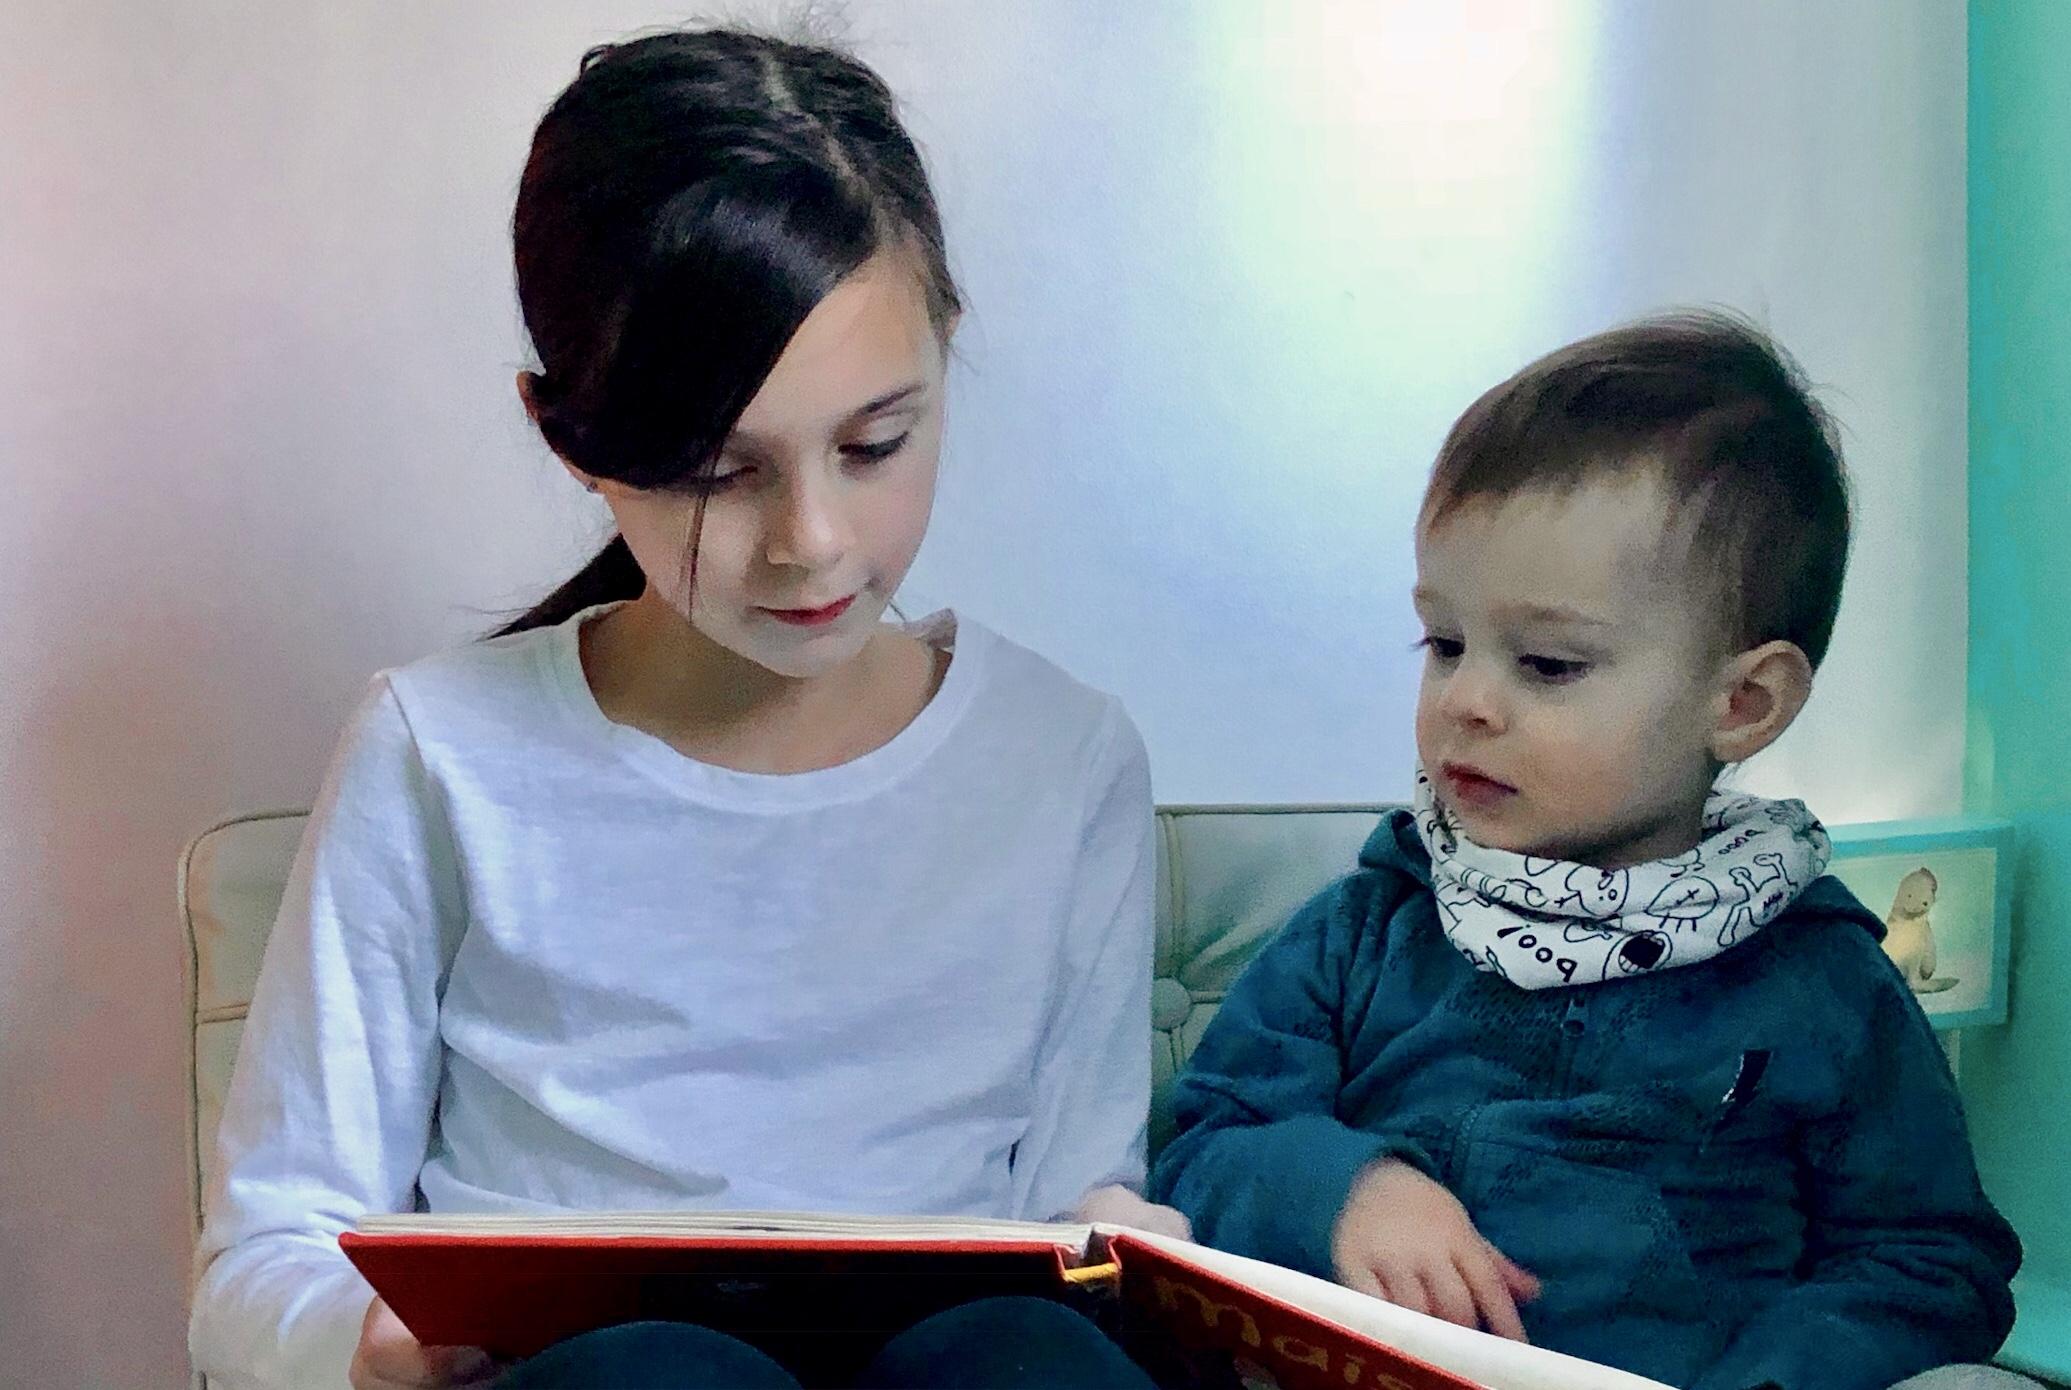 Parenting Challenge: Raising Good Little People